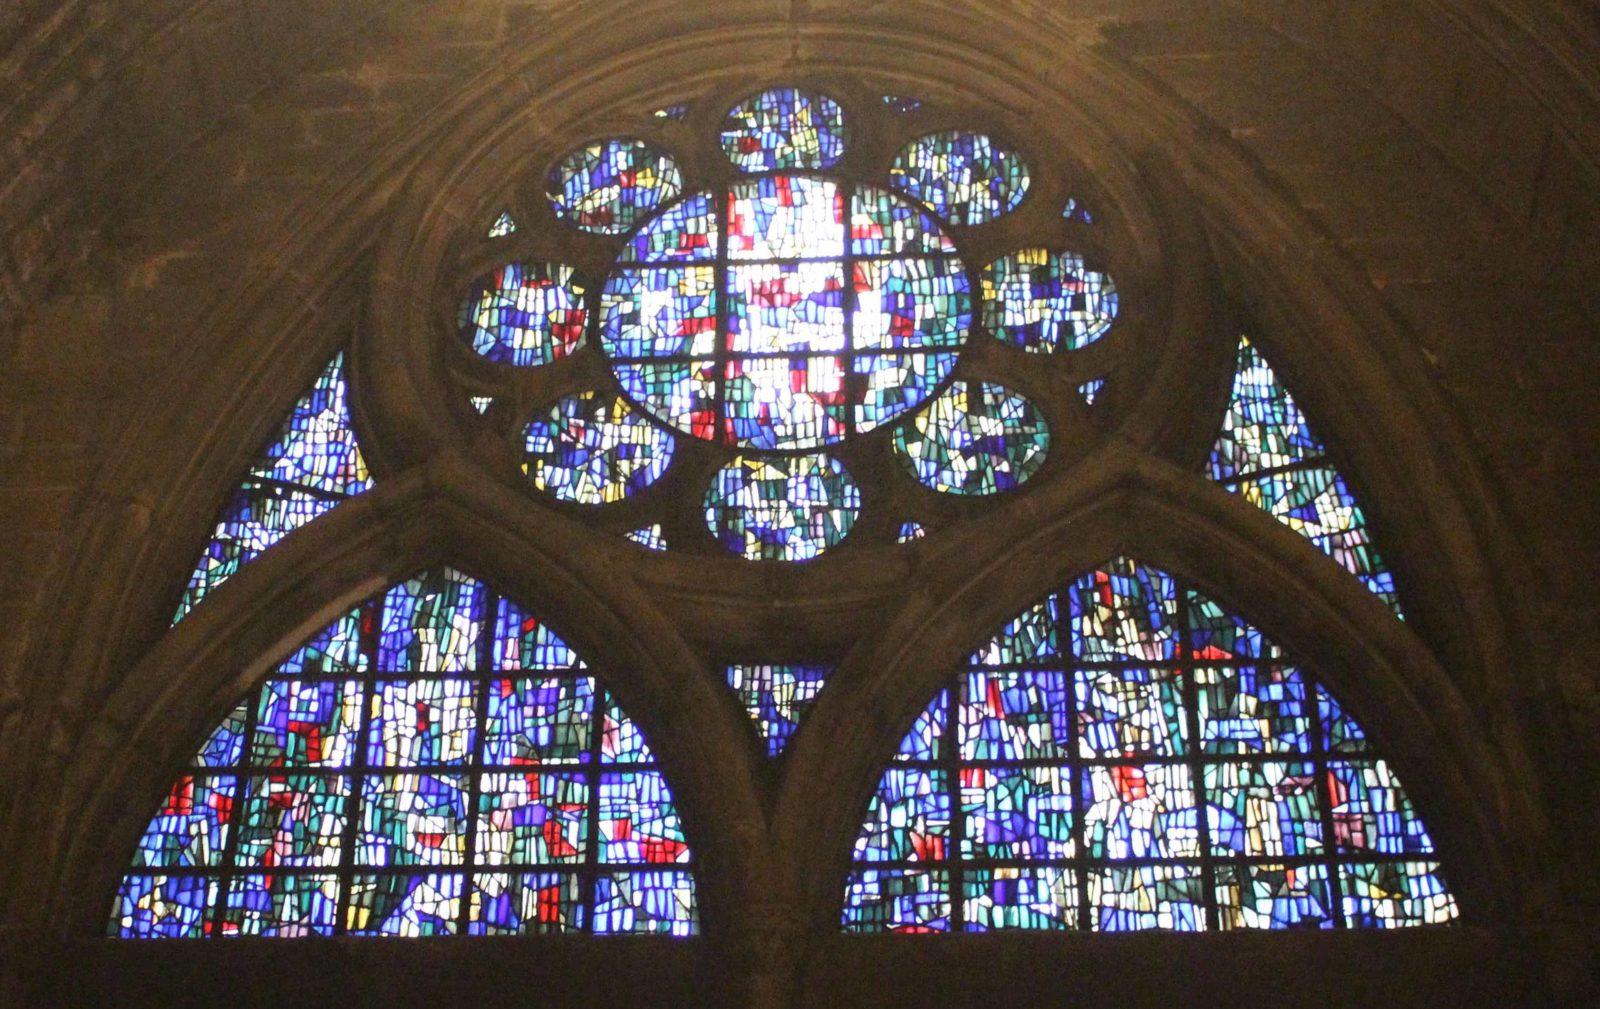 Metz cathédrale vitraux Bissière